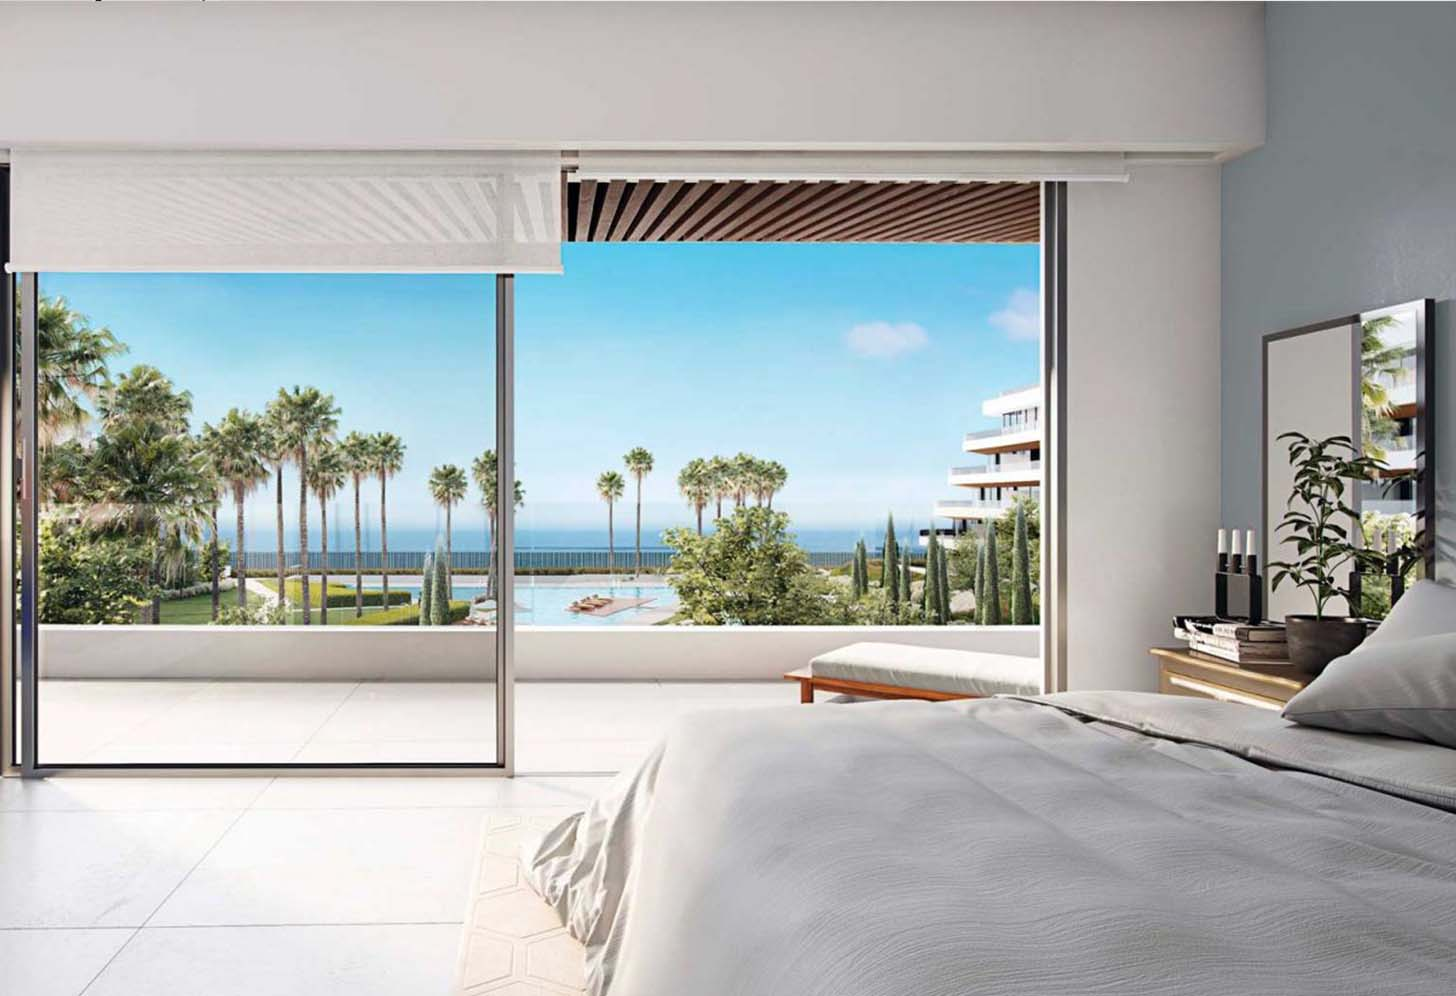 immobilier neuf espagne costa del sol on-e14 nereidas residential chambre